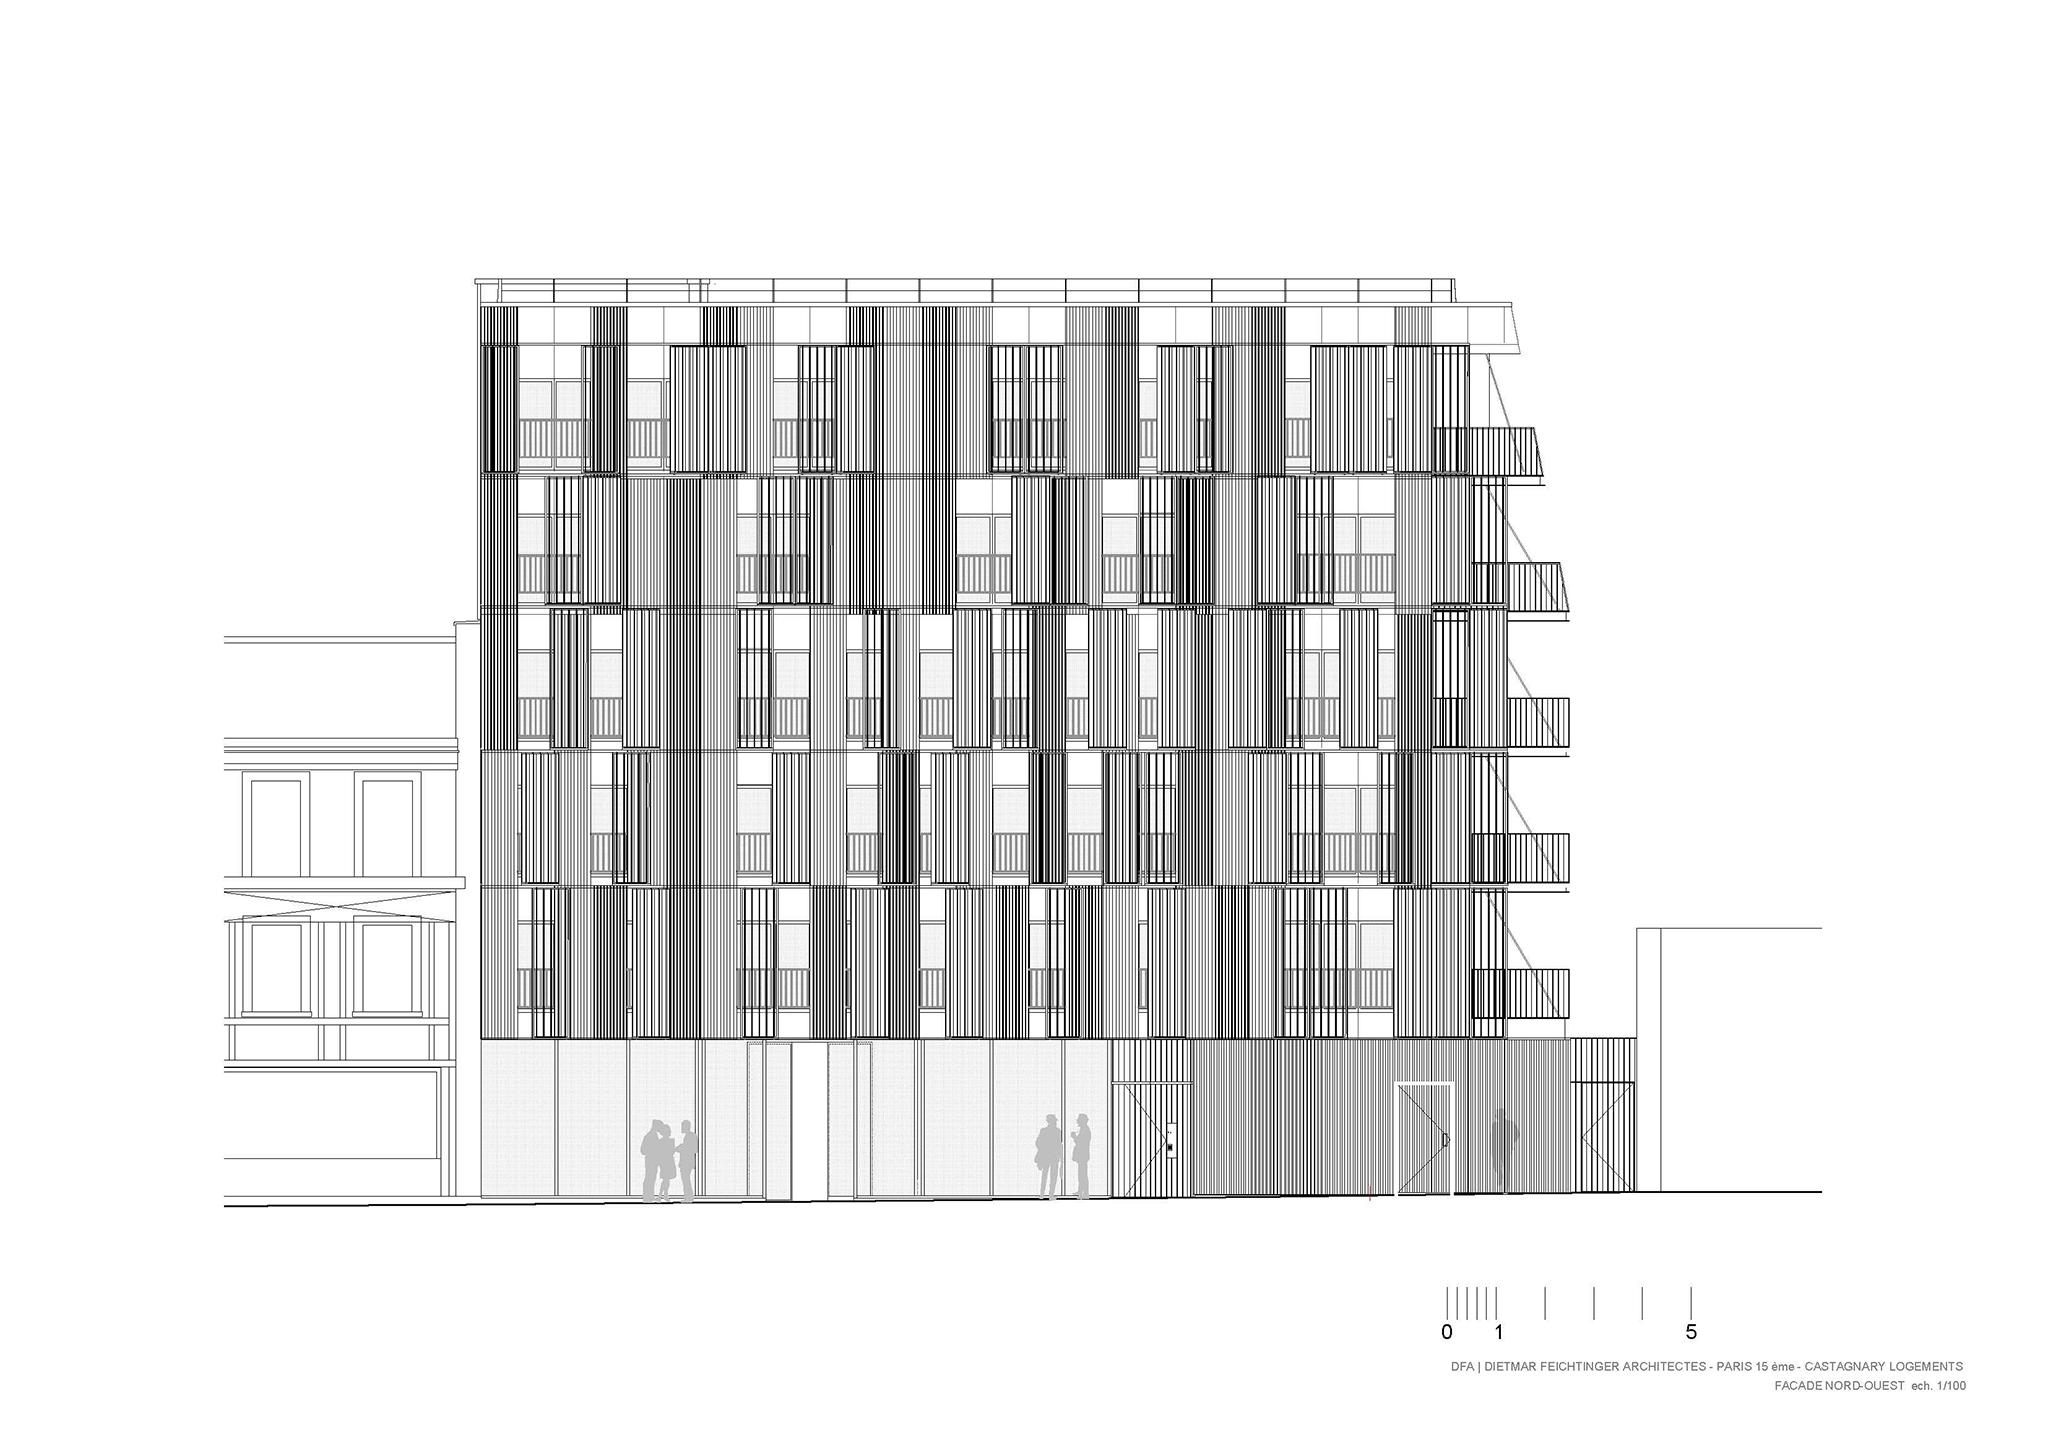 10 social housing units Paris 15e by Dietmar Feichtinger